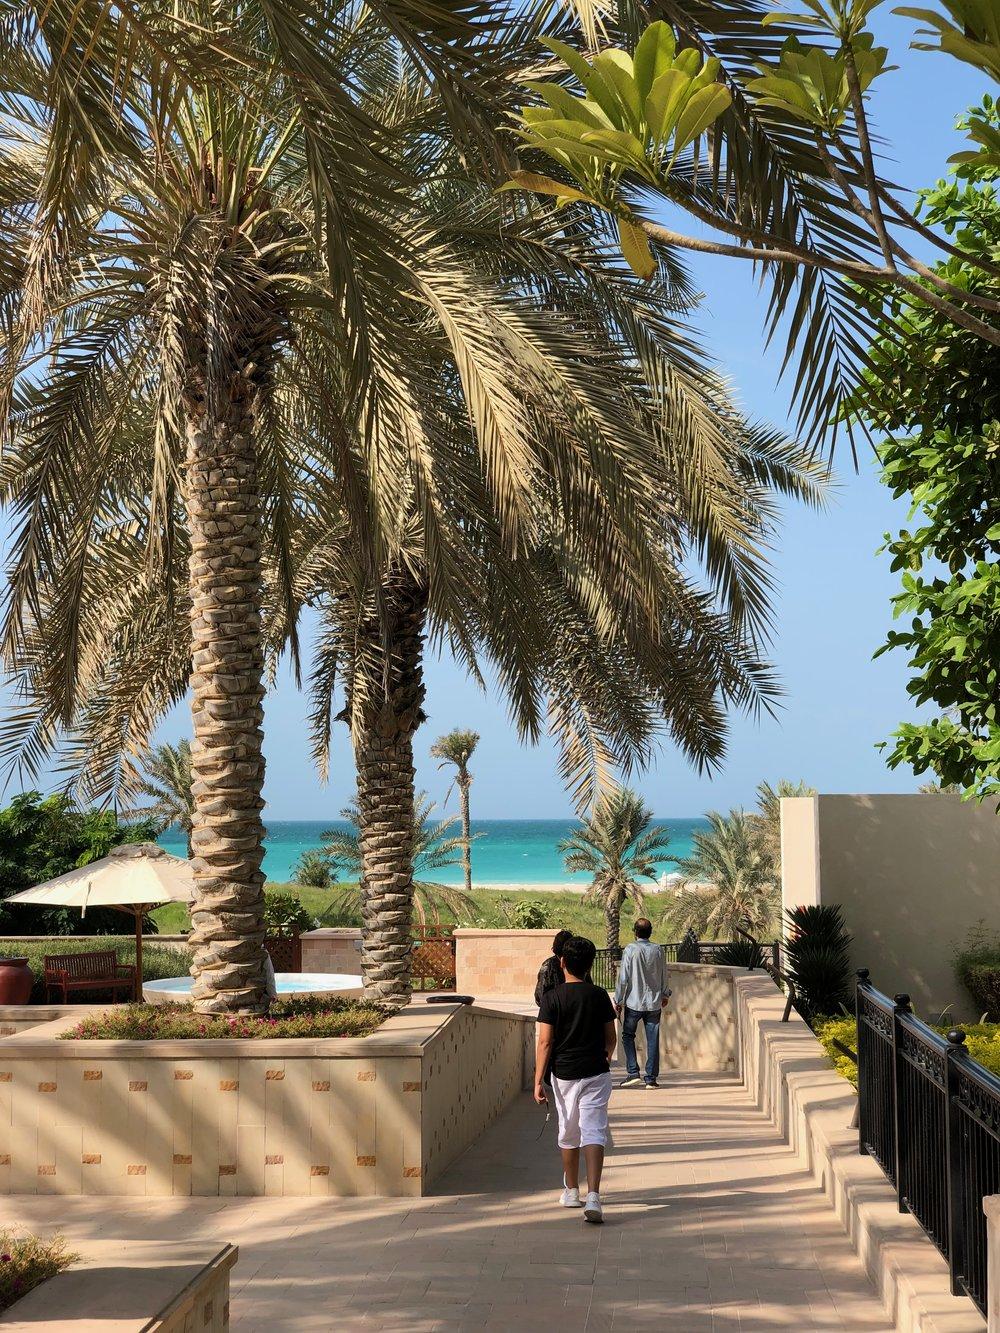 WALK TO THE BEACH ST. REGIS, ABU DHABI.jpg